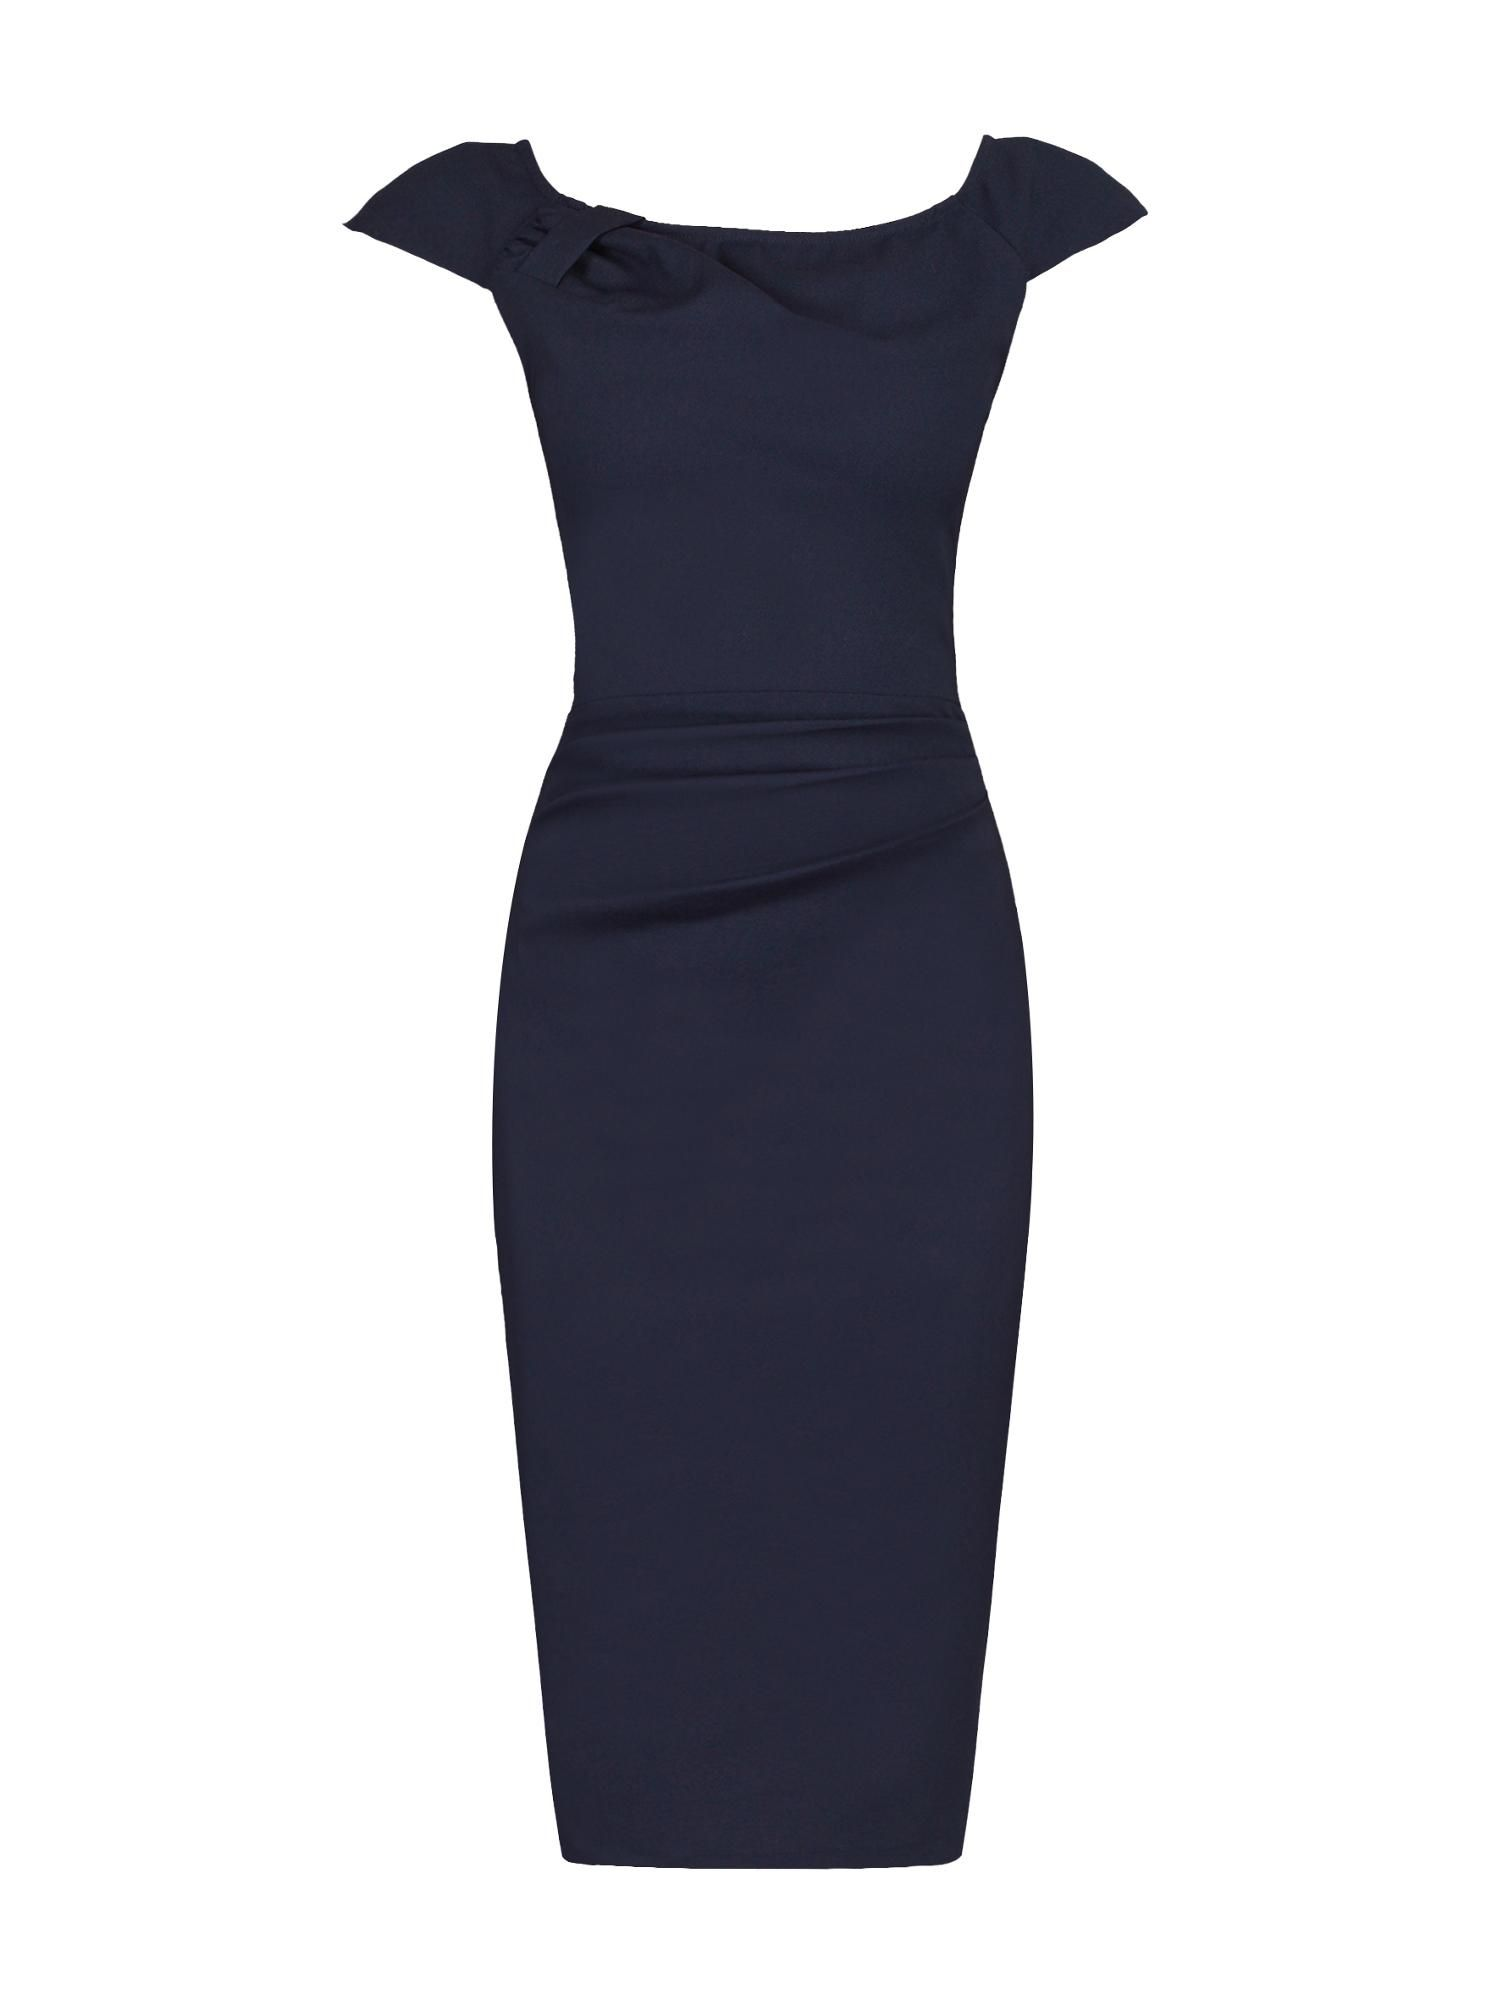 Black dress house of fraser - Jolie Moi Ruched 40s Wiggle Dress House Of Fraser